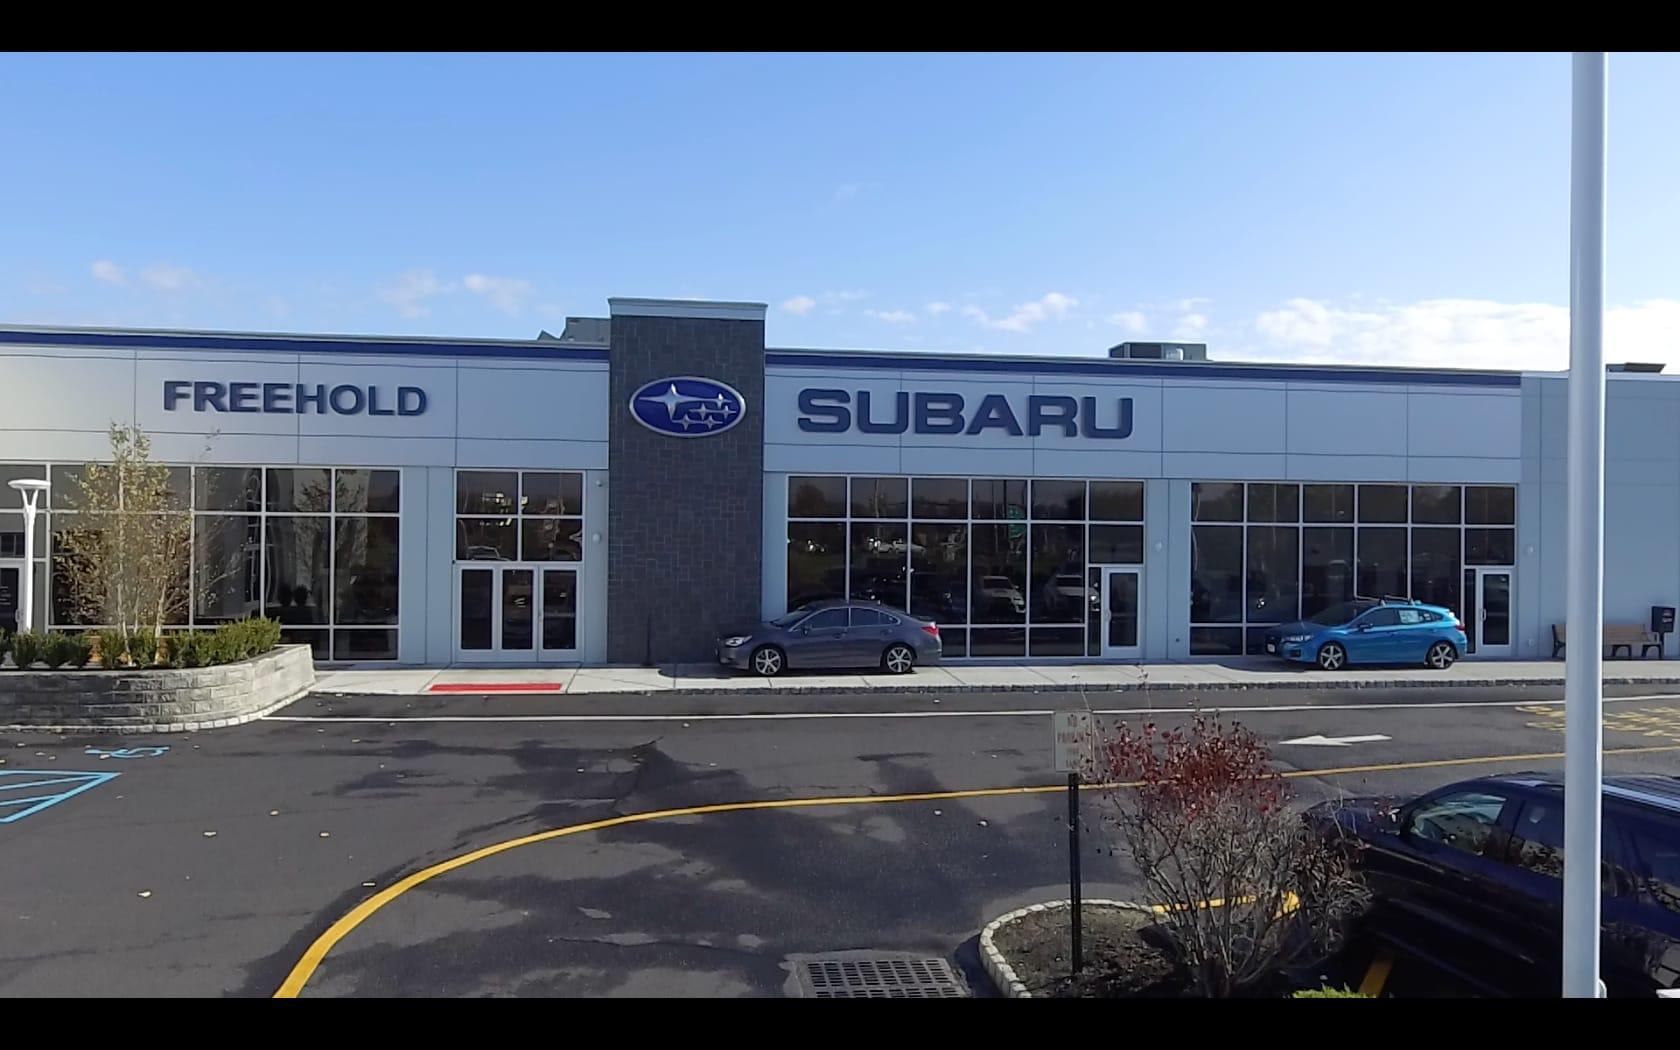 New 2018 2019 subaru dealer freehold subaru sedans suvs subaru drone extg solutioingenieria Image collections